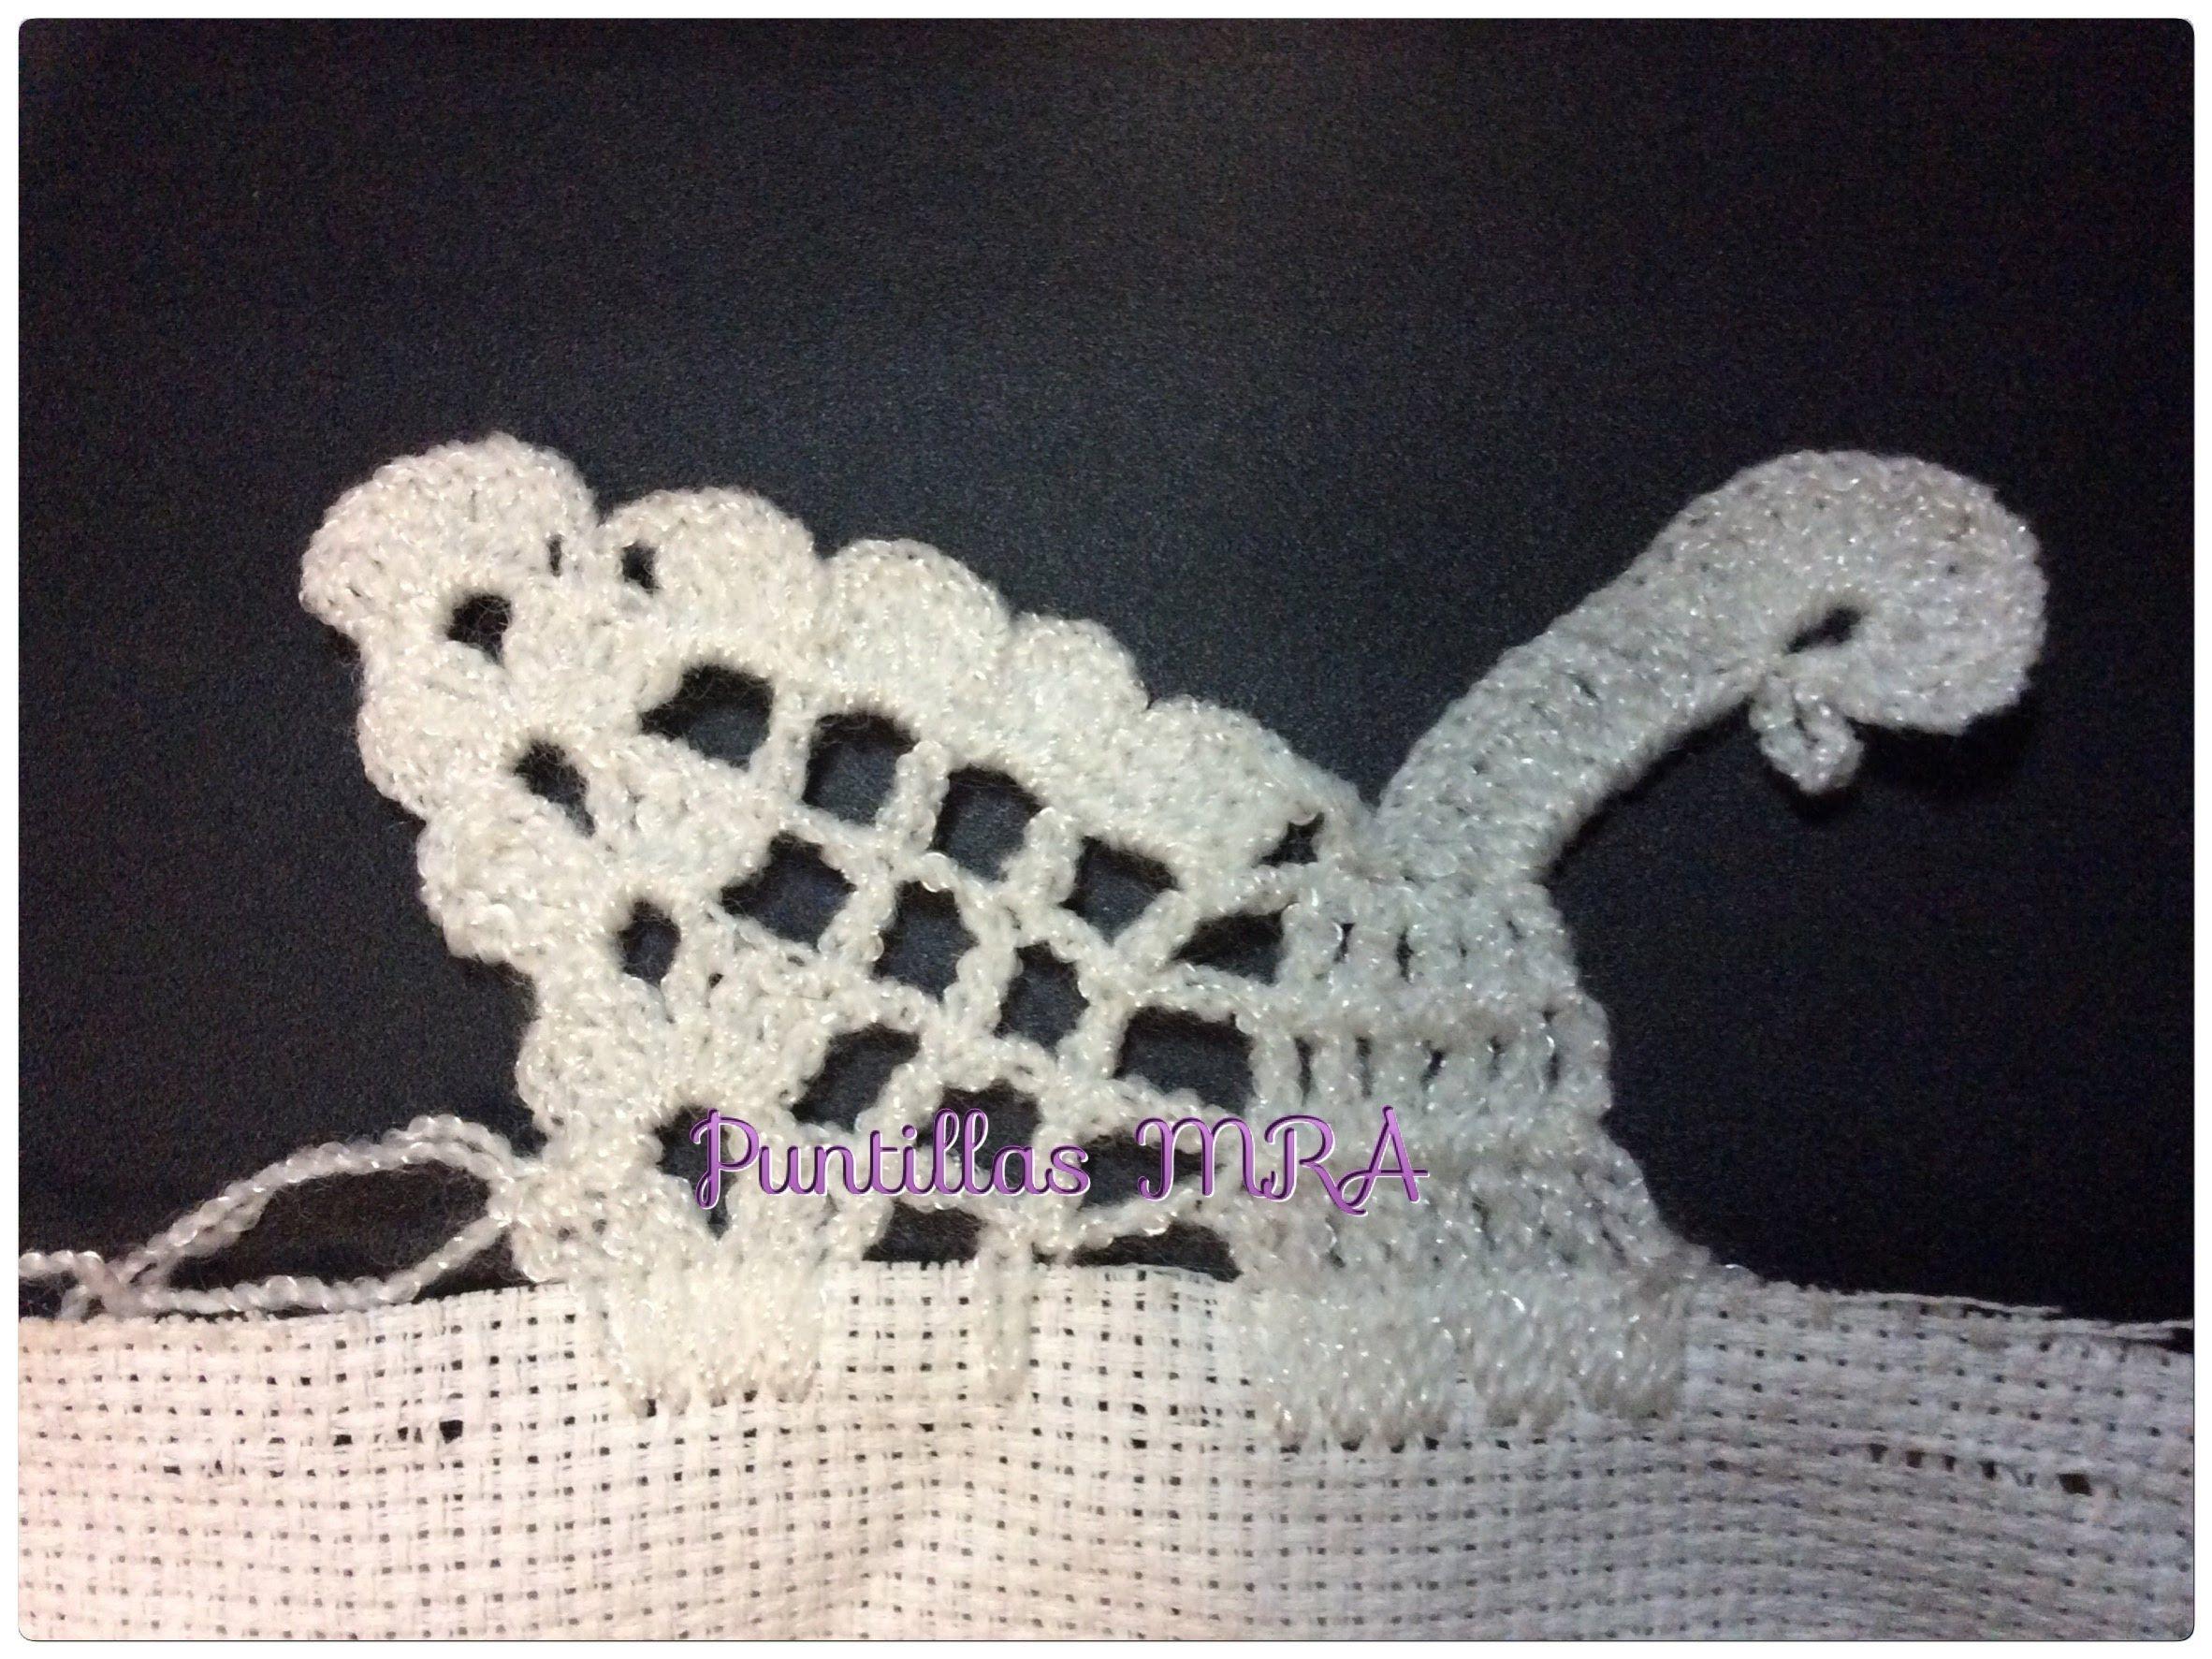 Puntilla para servilleta MRA Rocio Martinez   Moms crochet stuff ...